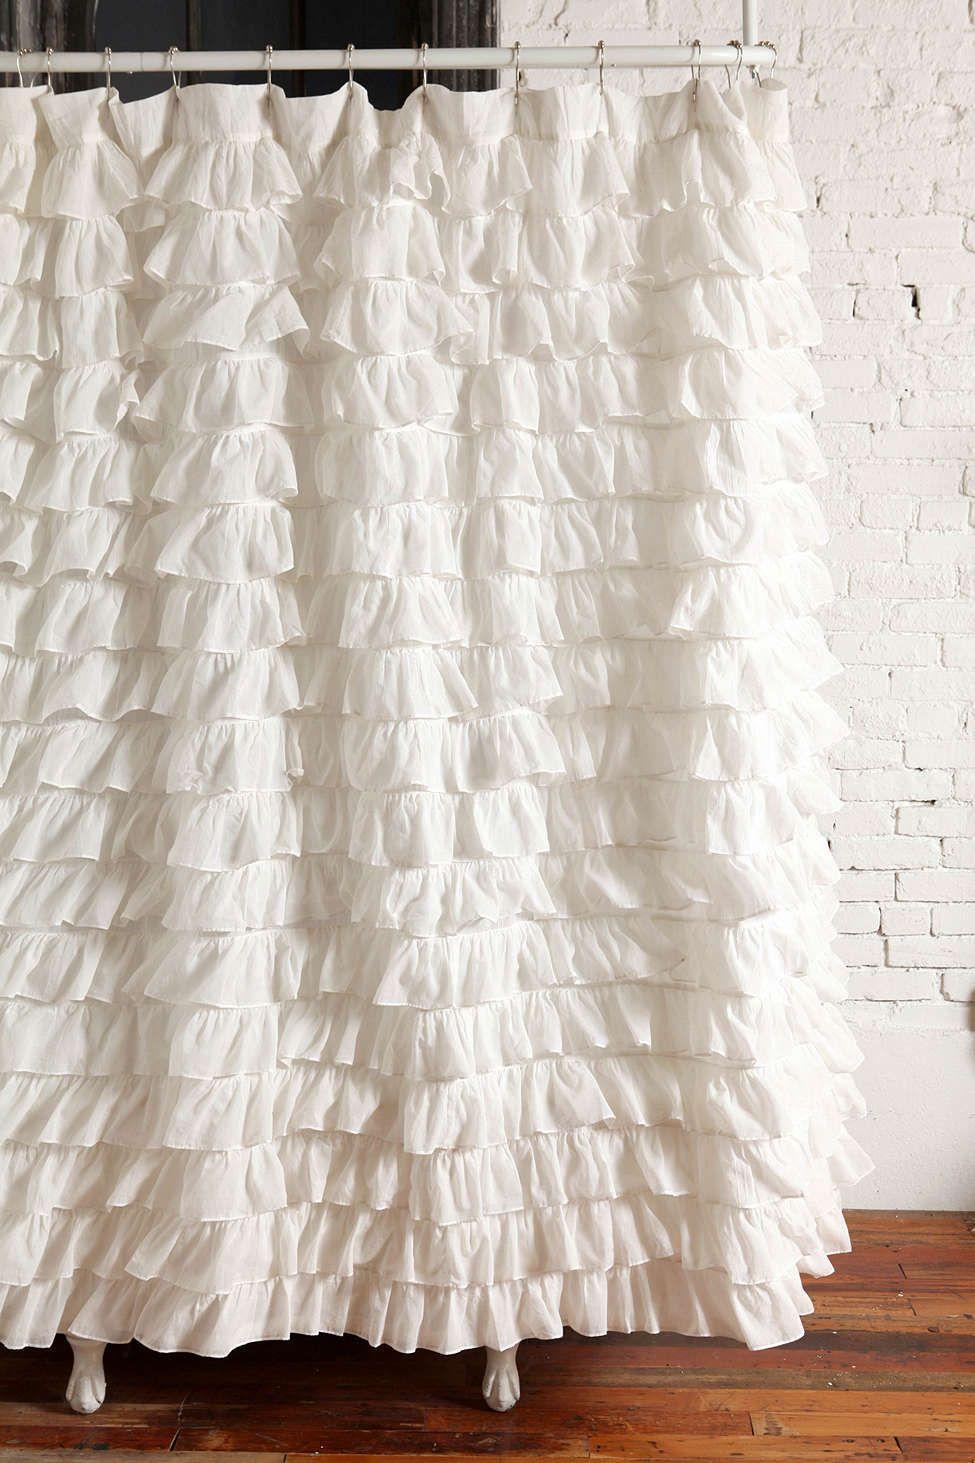 Waterfall ruffle shower curtain ruffle shower curtains and house